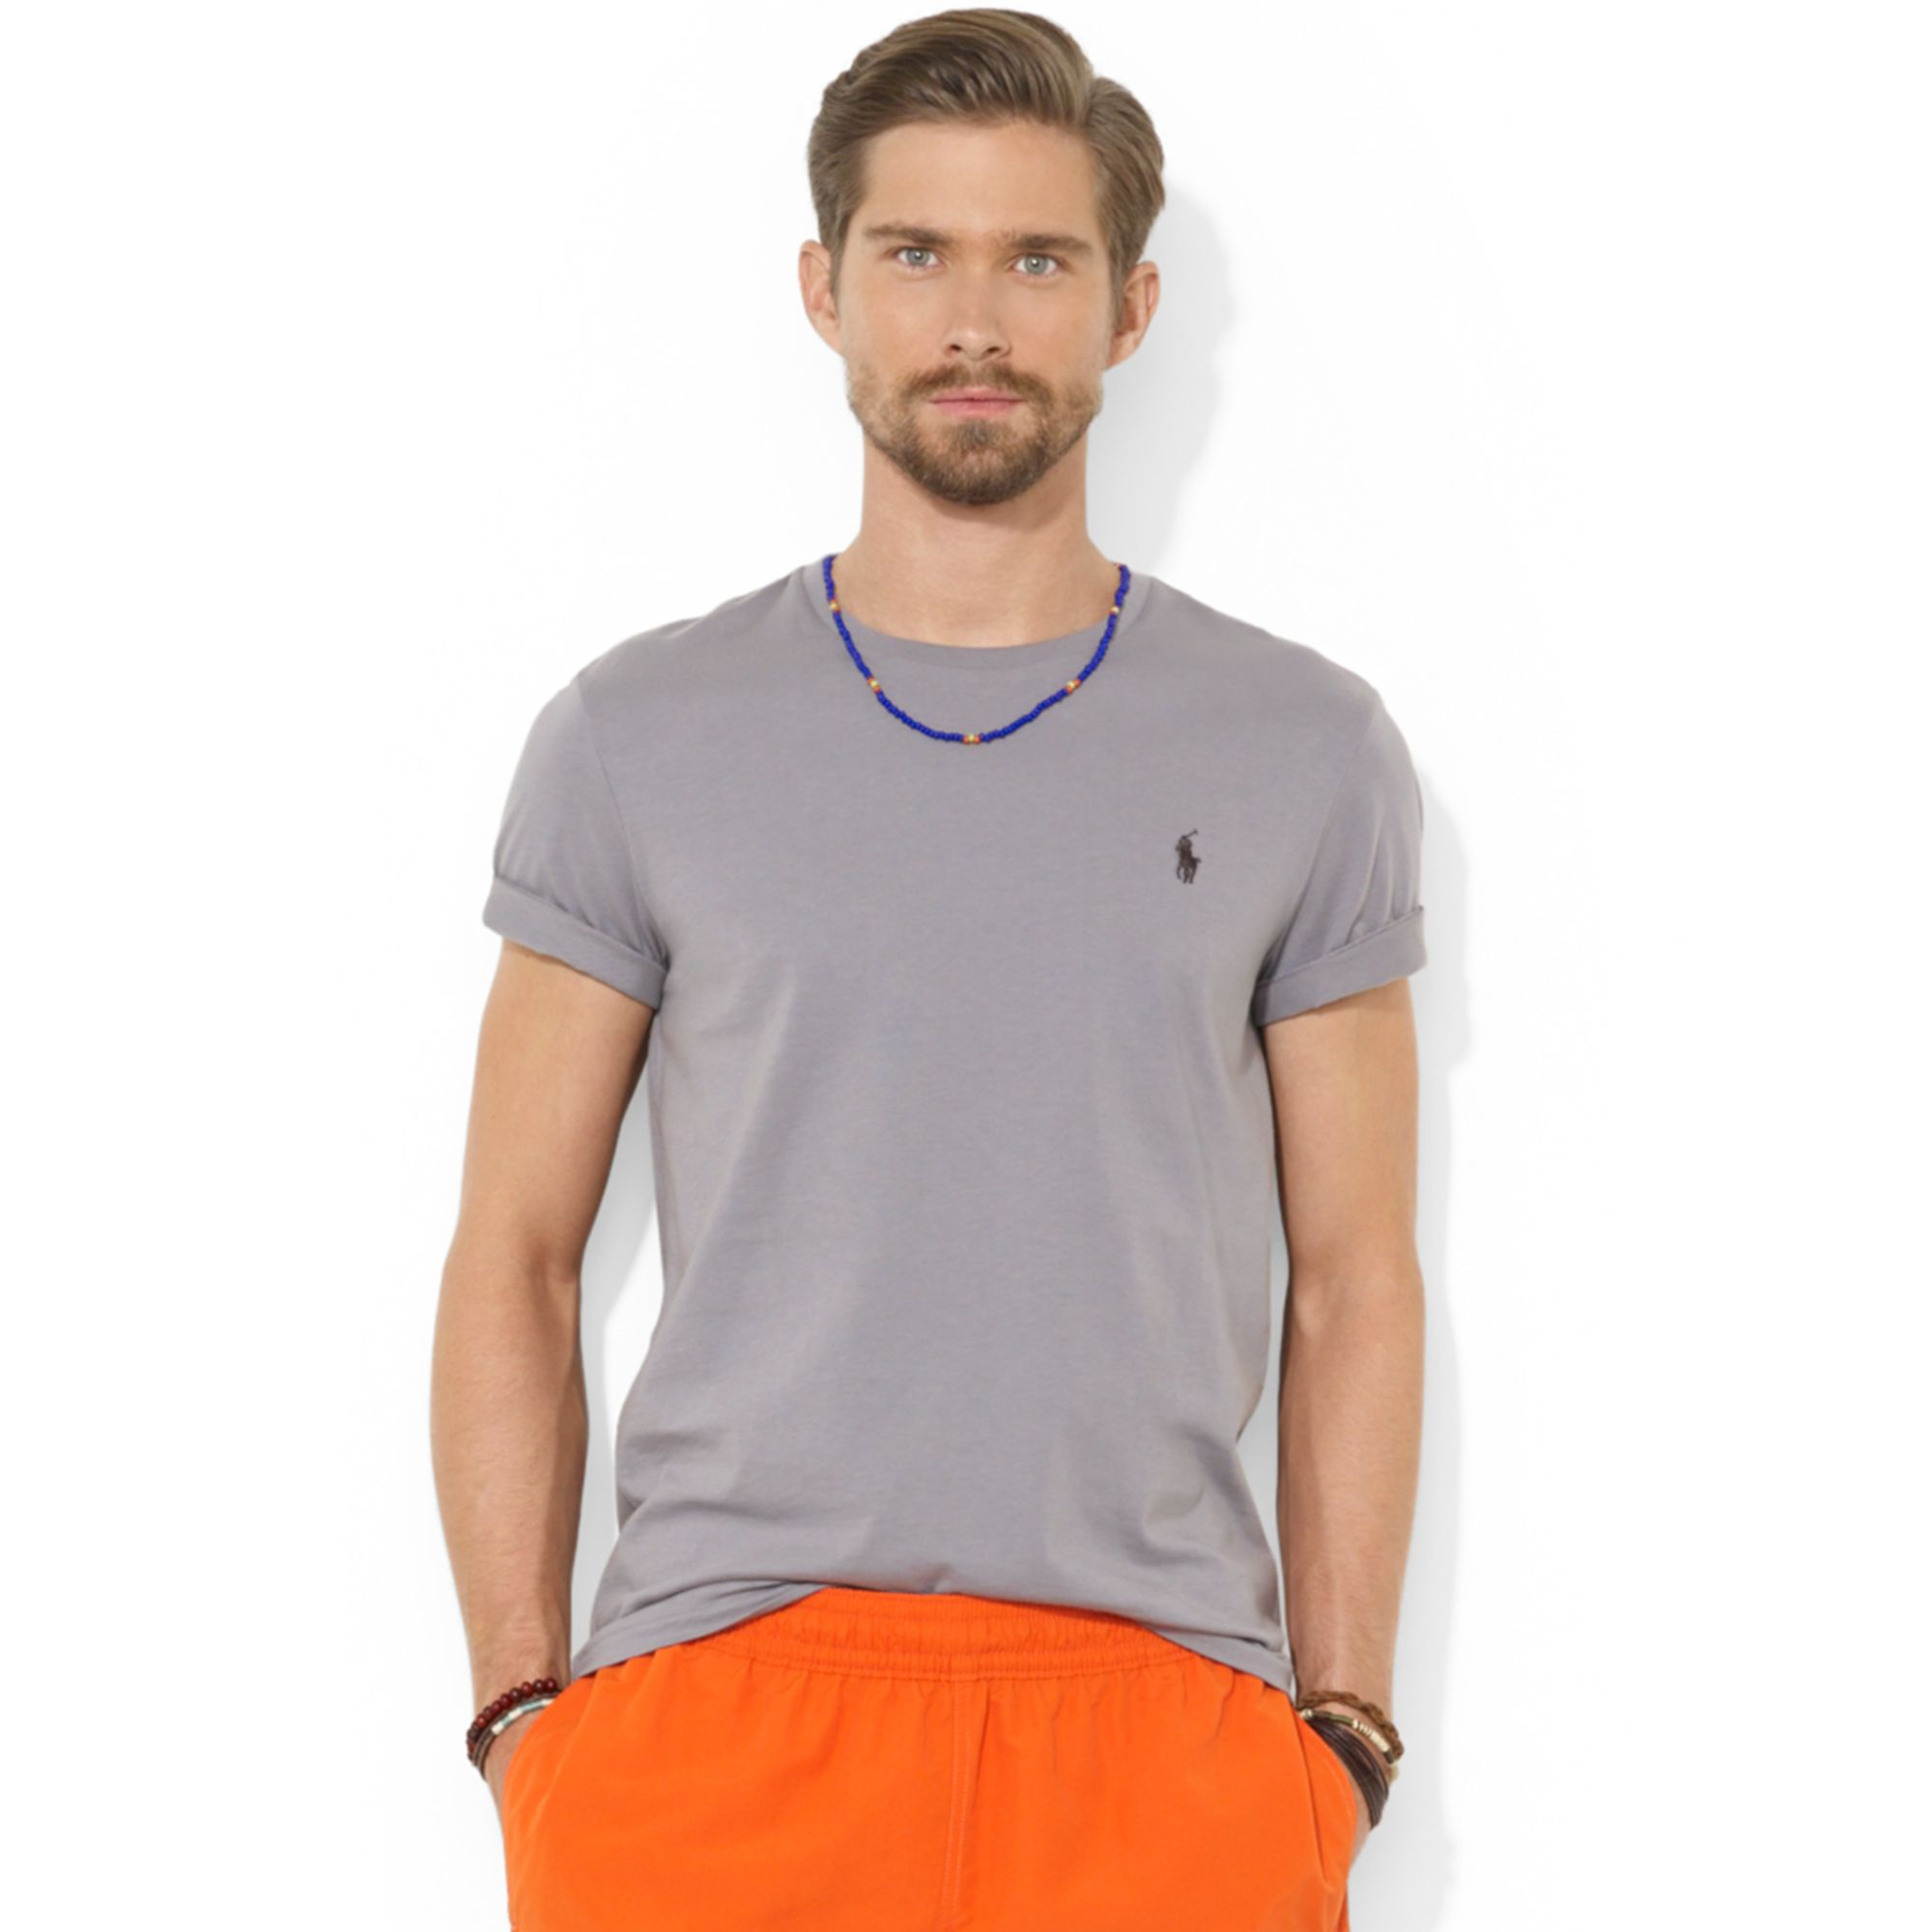 bbf8e8a4c00a6b Lyst - Ralph Lauren Polo Customfit Cotton Jersey T-shirt in Gray for Men